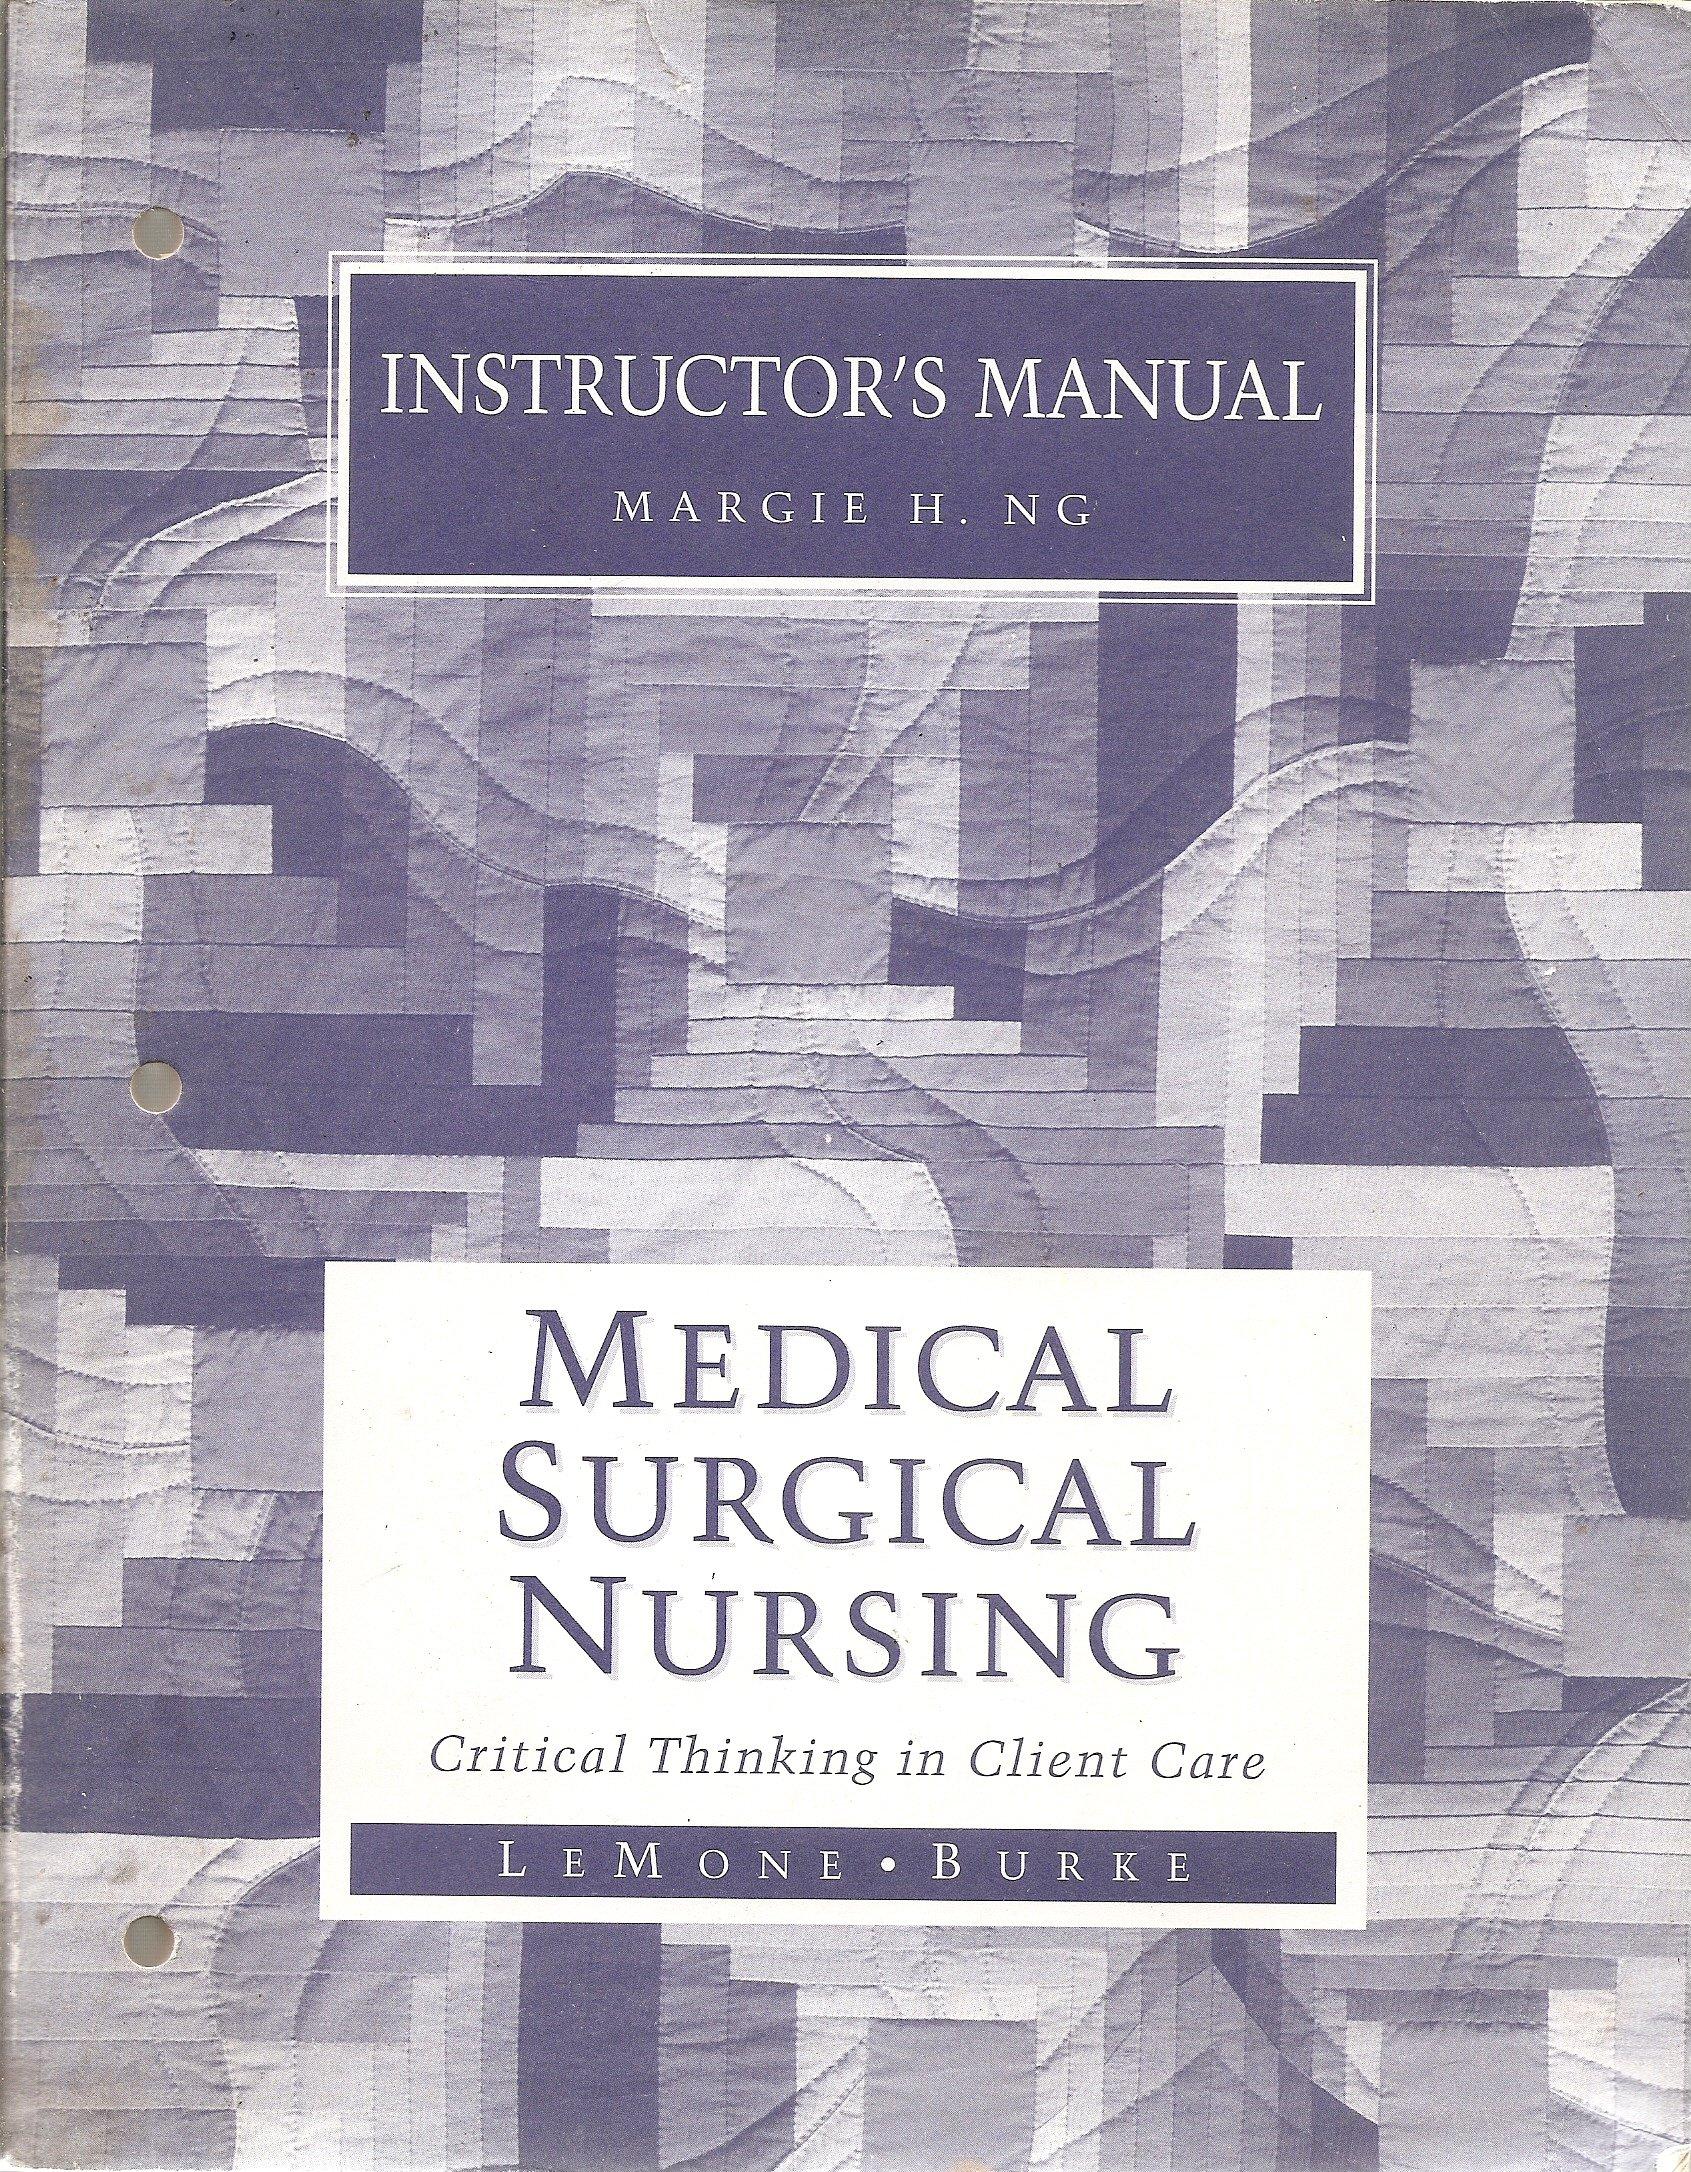 Instructors Manual to Medical Surgical Nursing: LEMONE: 9780805340778:  Amazon.com: Books